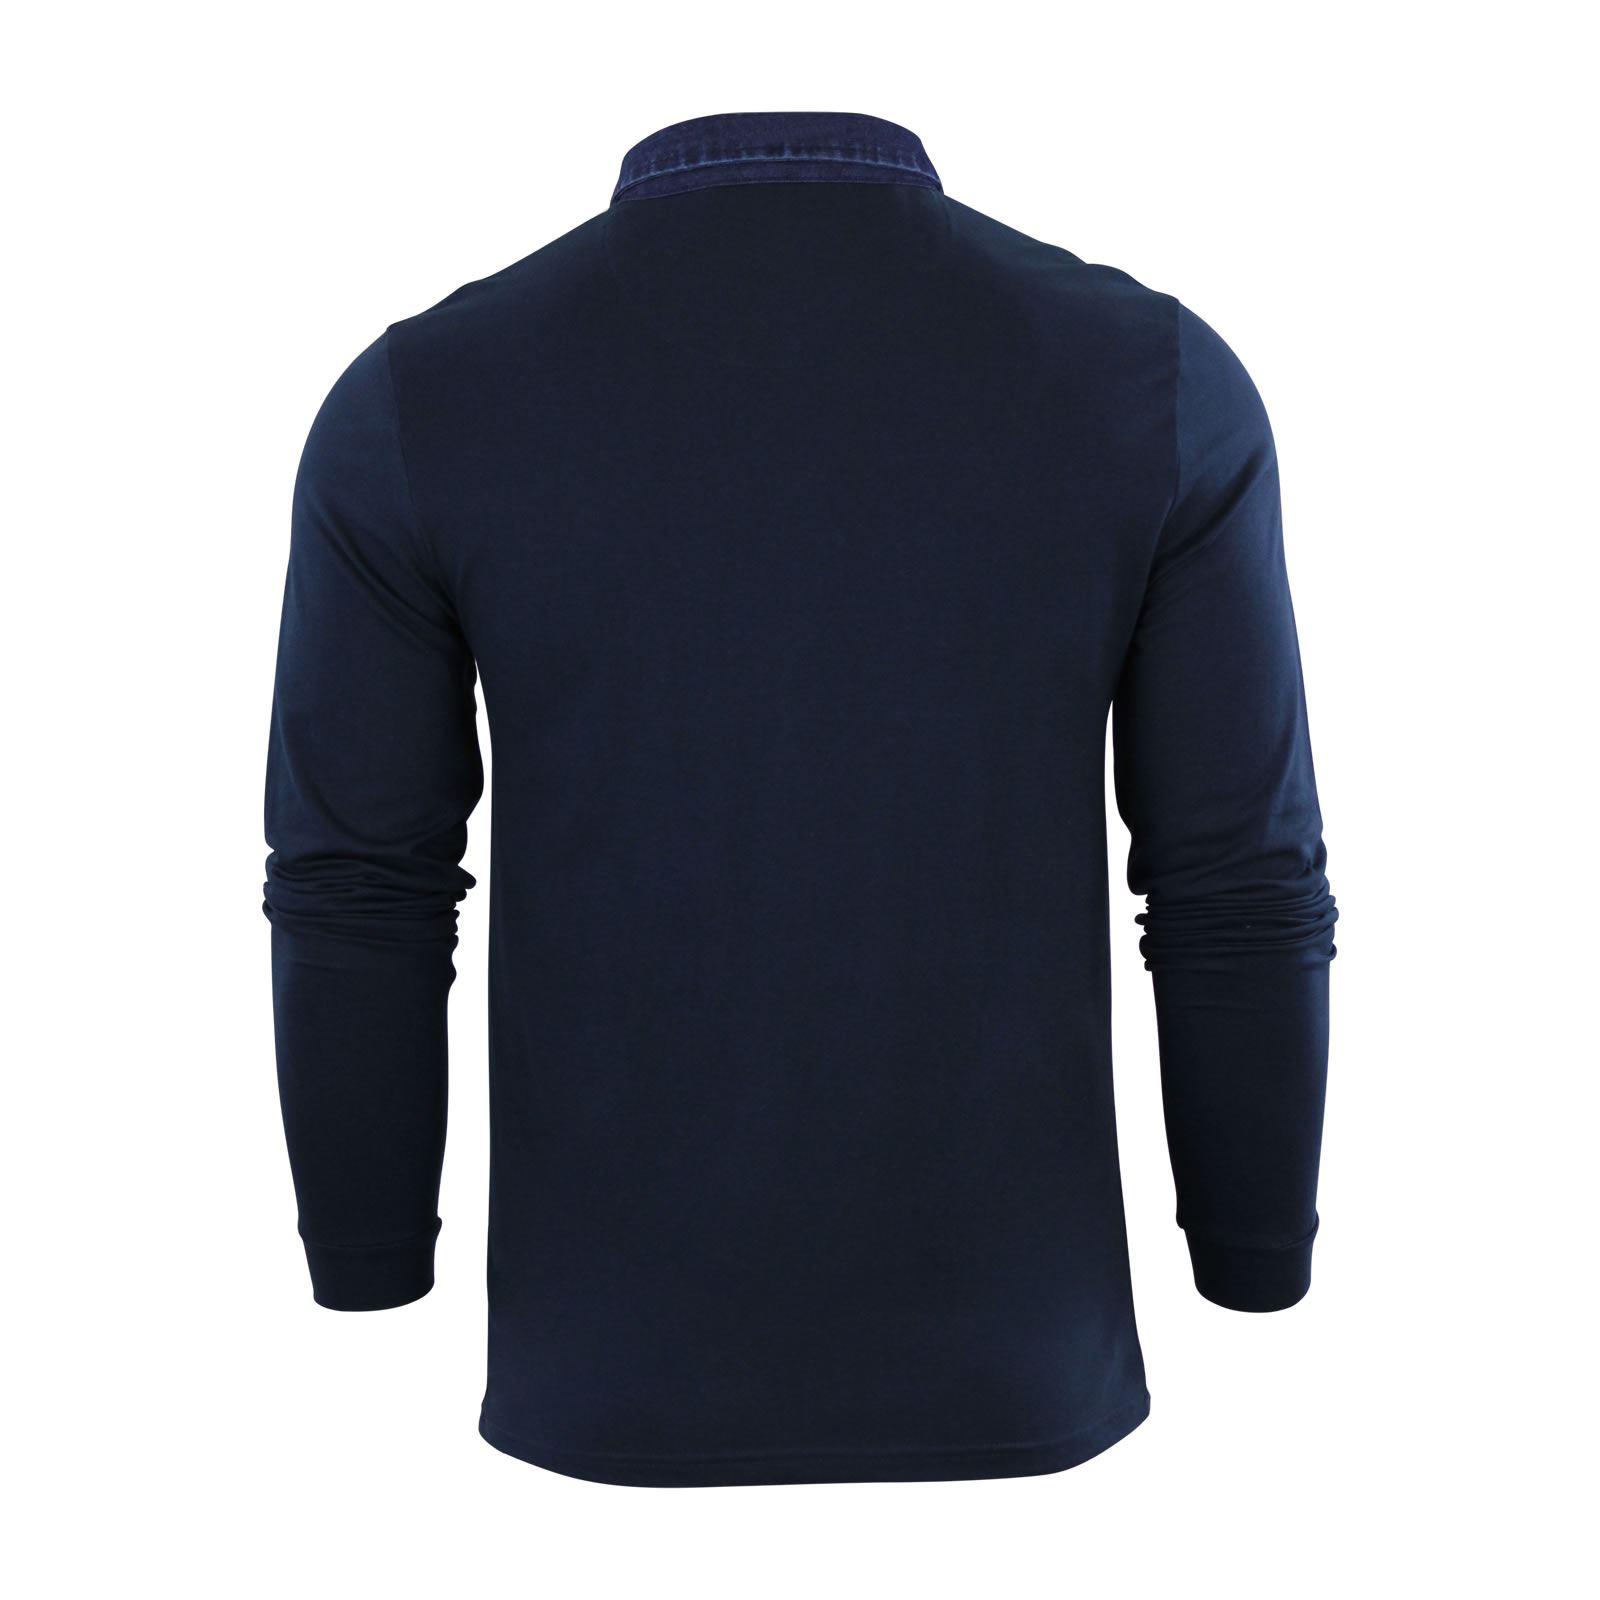 Brave-Soul-Gospel-Homme-Polo-T-Shirt-Denim-a-col-a-manches-longues-Top-Casual miniature 3